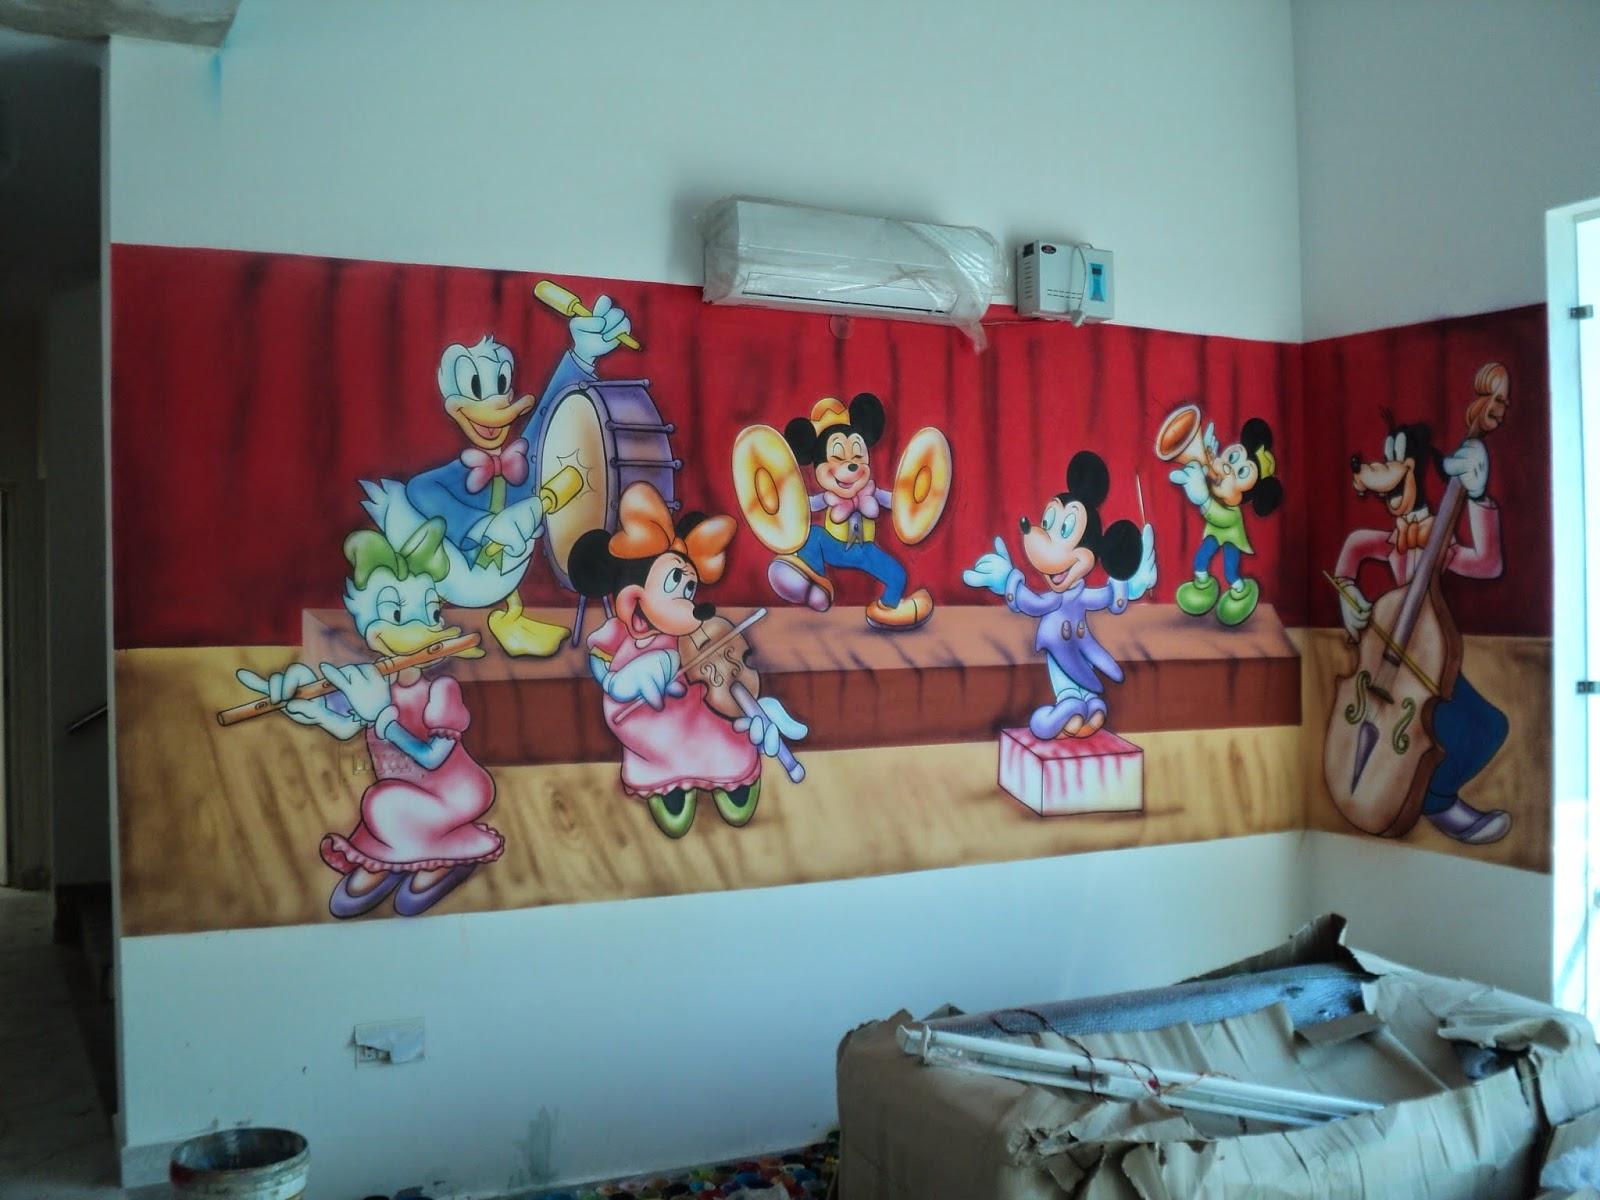 Play School Wall Painting 3d Wall Painting Cartoon